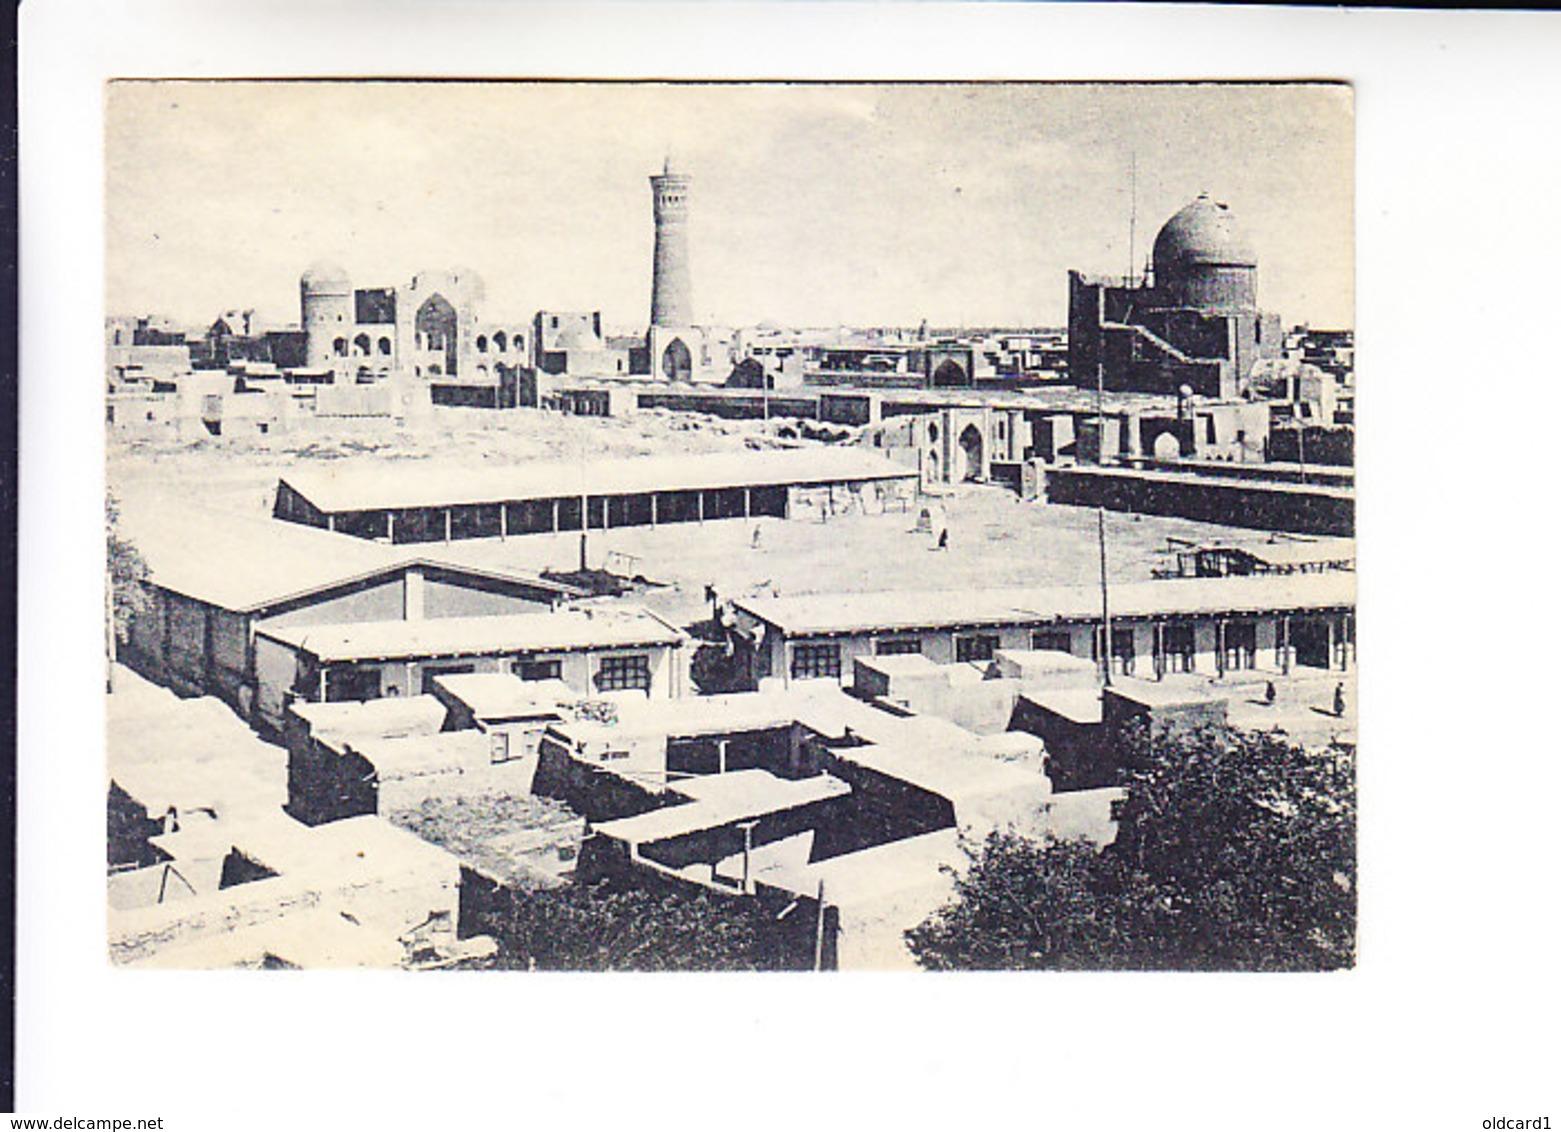 Middle Central Asia BUKHARA GENERAL VIEW - Uzbekistan